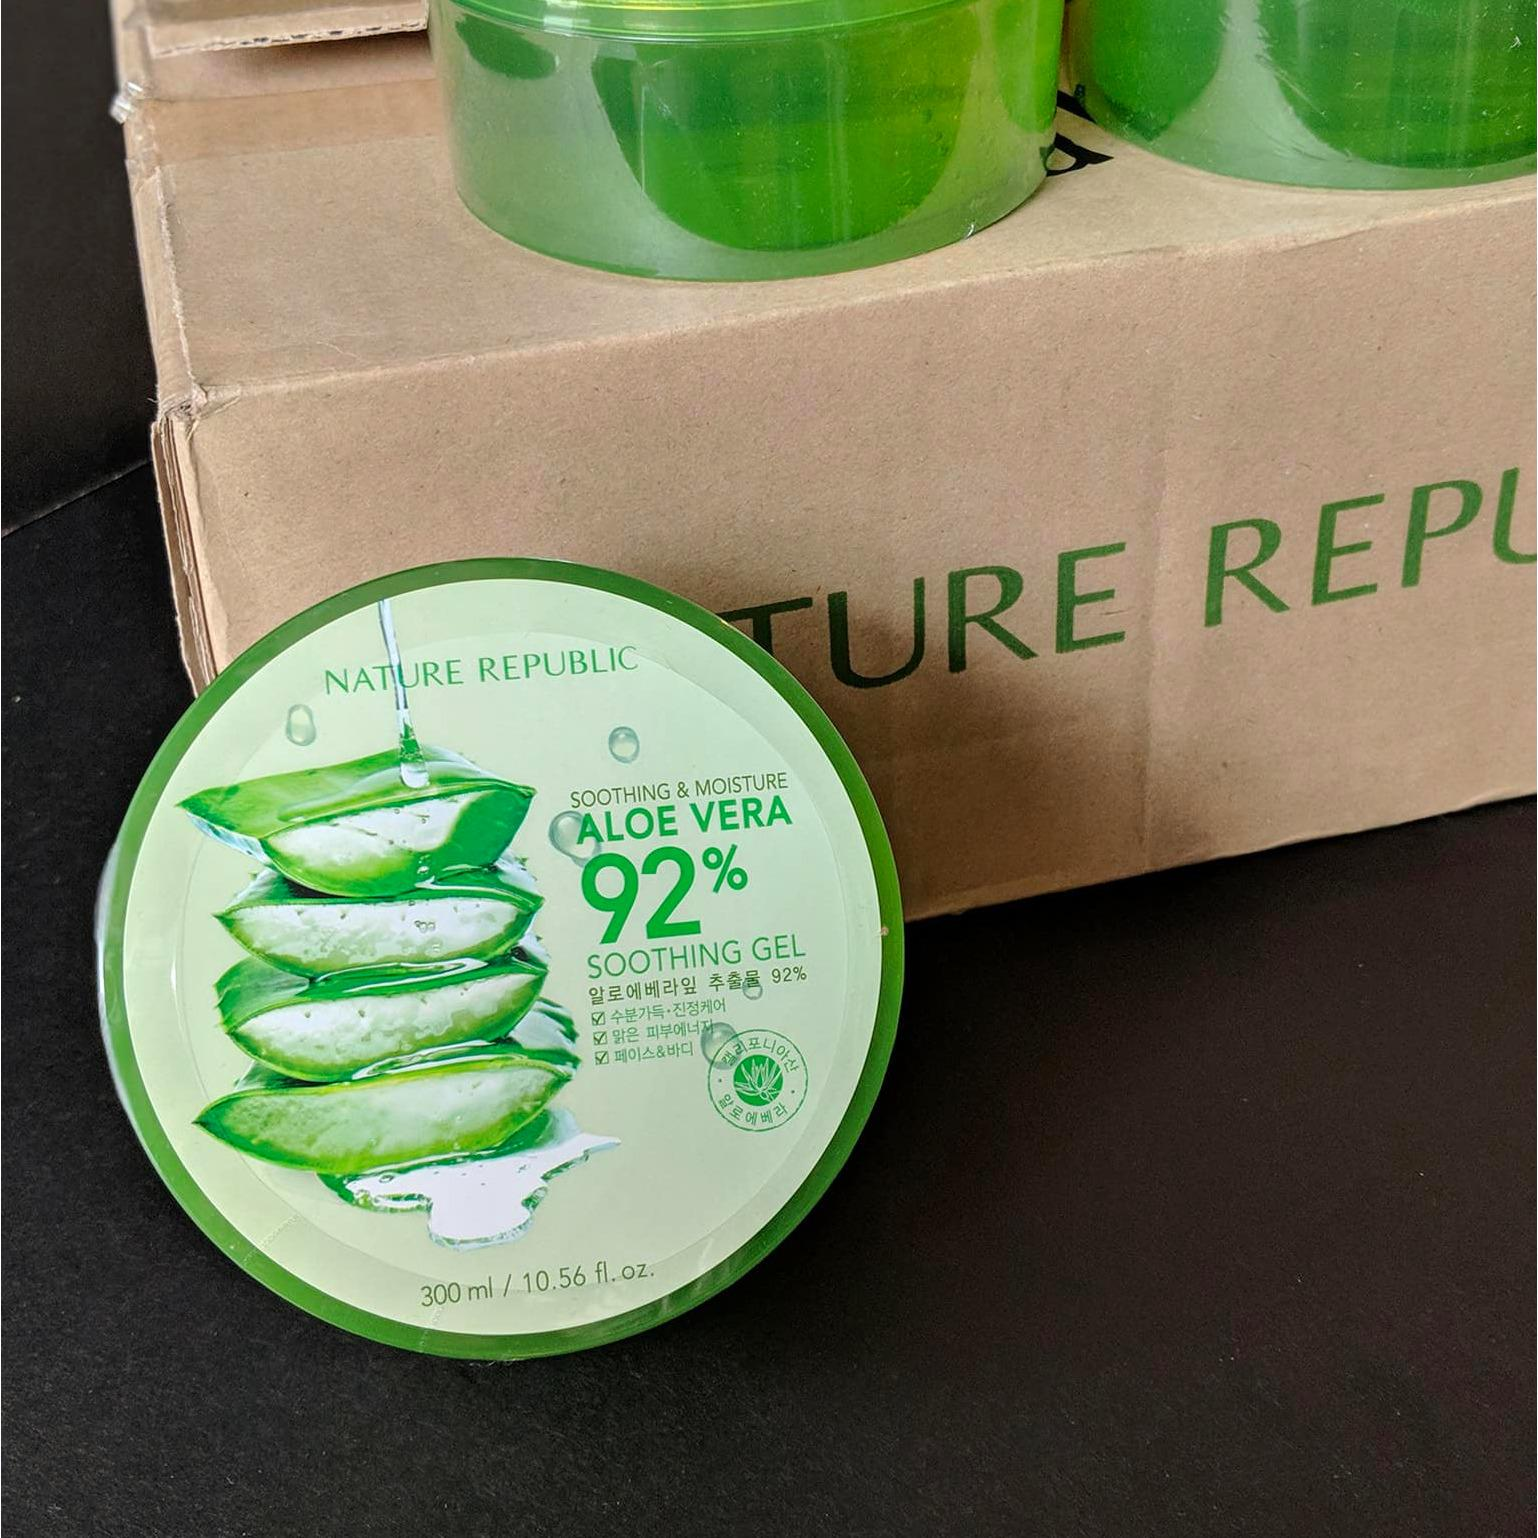 The Price Of Nature Republic 100 Authentic Aloe Vera Soothing Gel 92 300ml Original From Korea